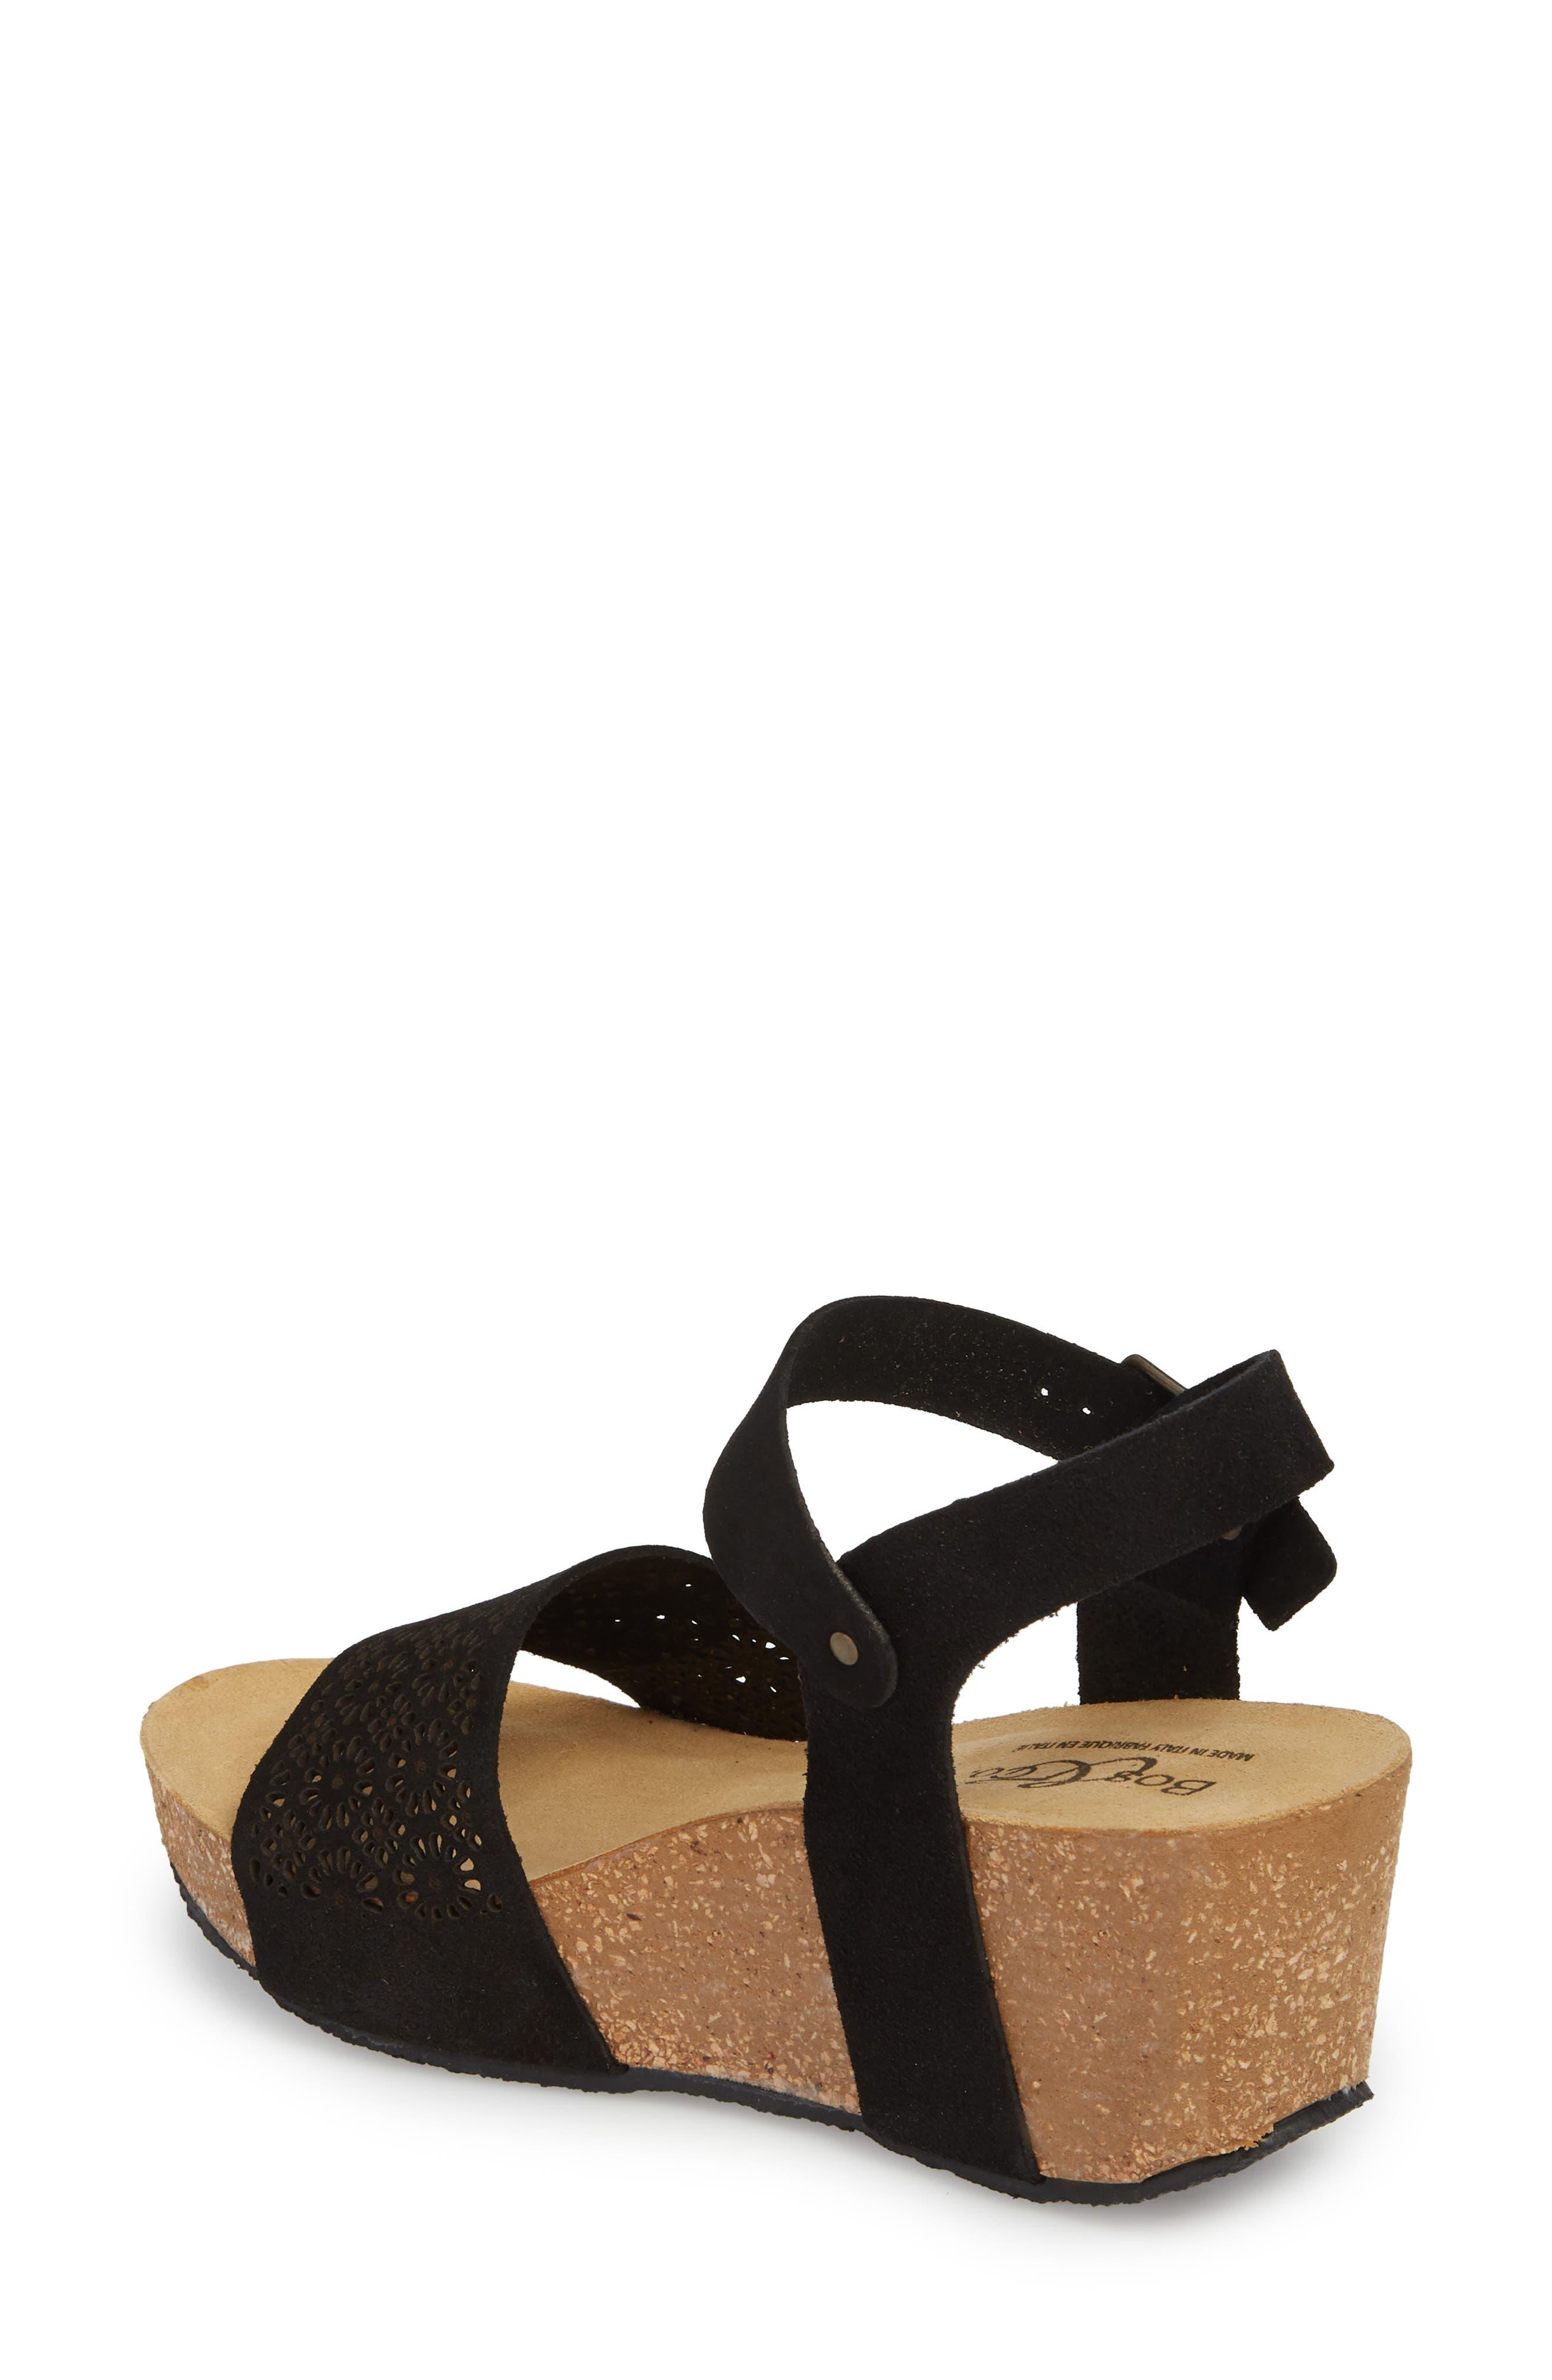 Lolo Platform Wedge Sandal,                             Alternate thumbnail 2, color,                             BLACK SUEDE